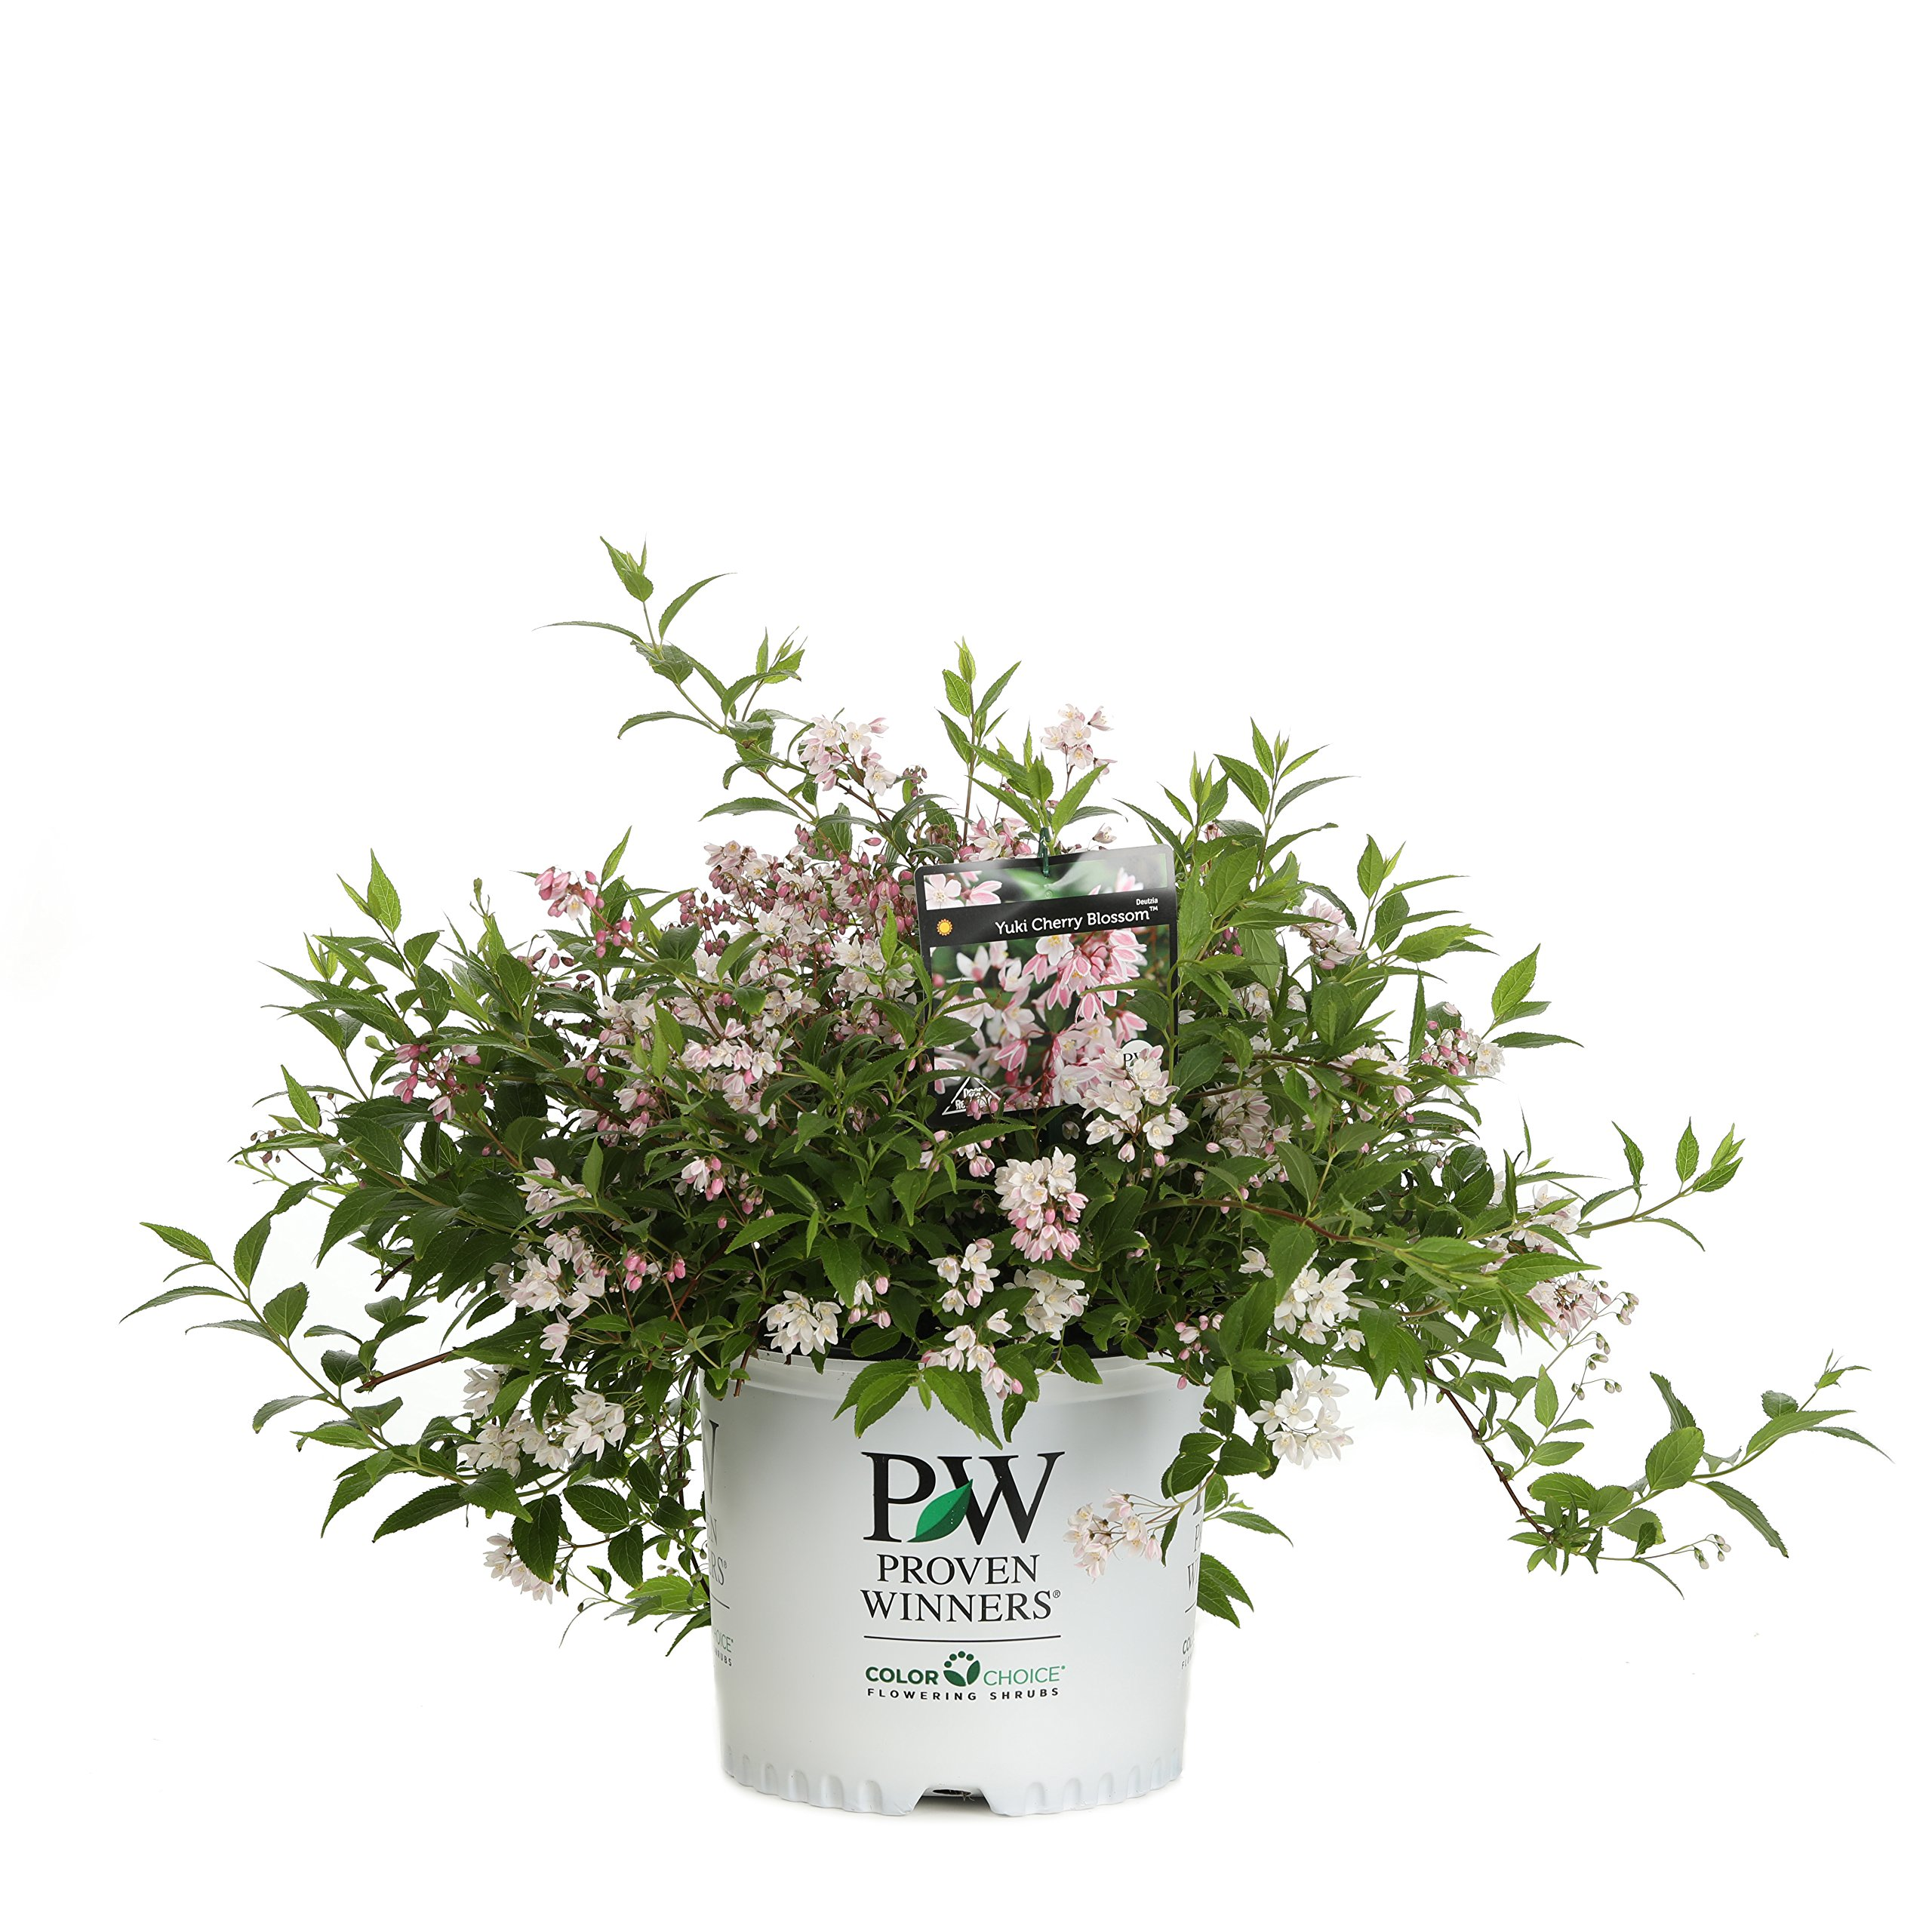 Yuki Cherry Blossom (Deutzia) Live Shrub, Light Pink Flowers, 3 Gallon by Proven Winners